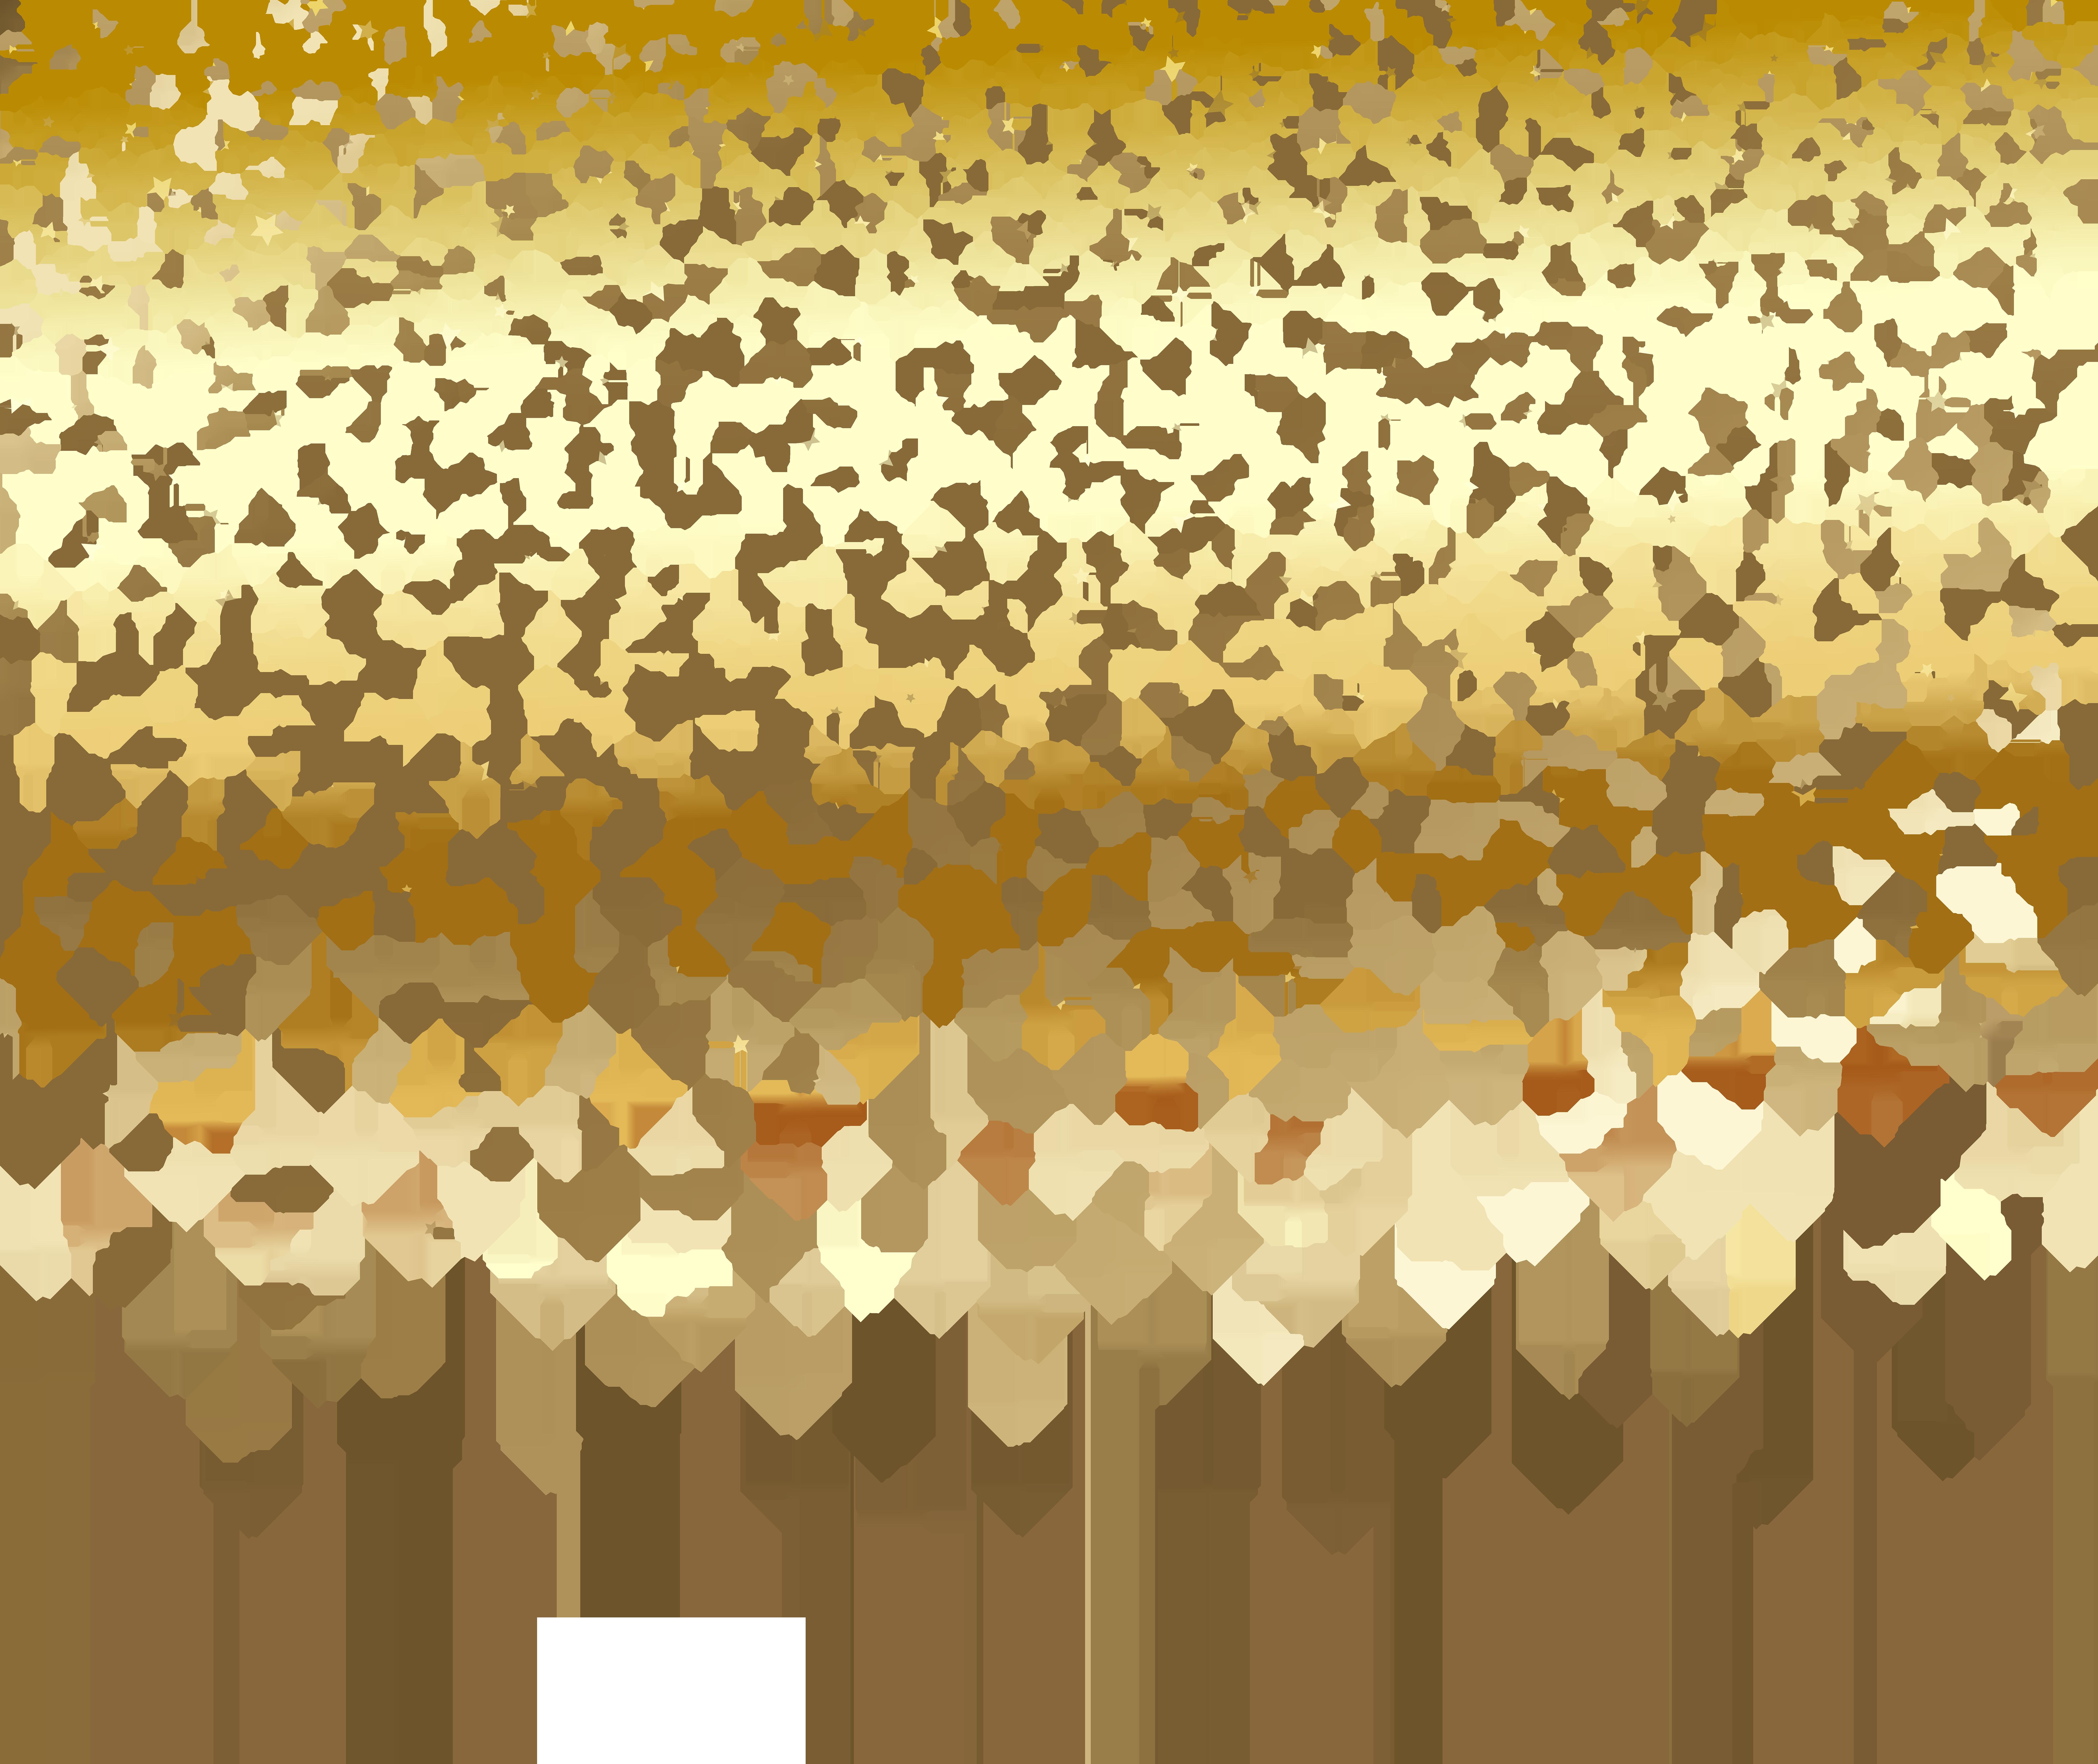 Https gallery yopriceville com. Decoration clipart confetti